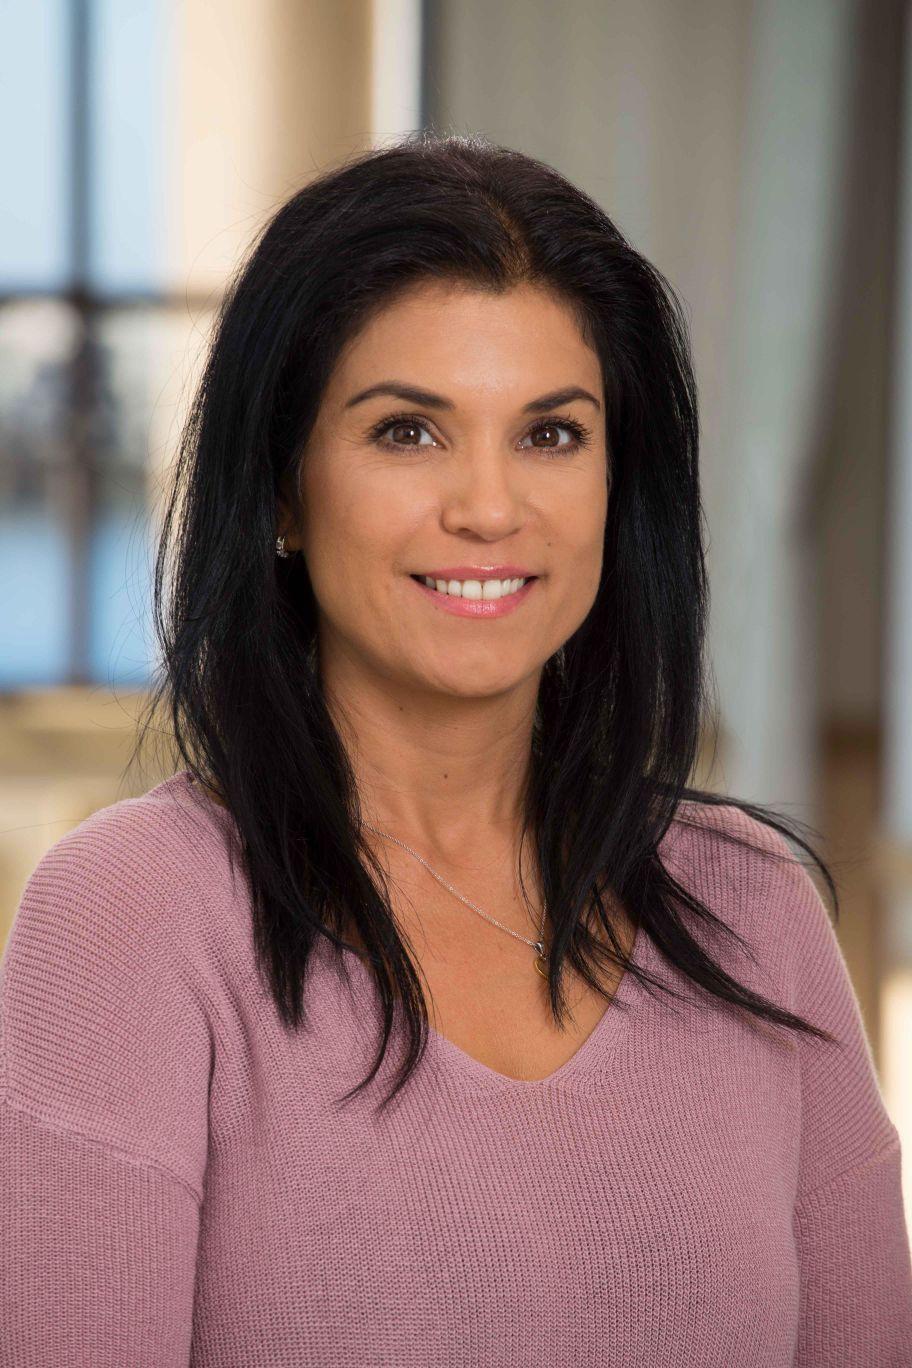 Evelyn Salazar